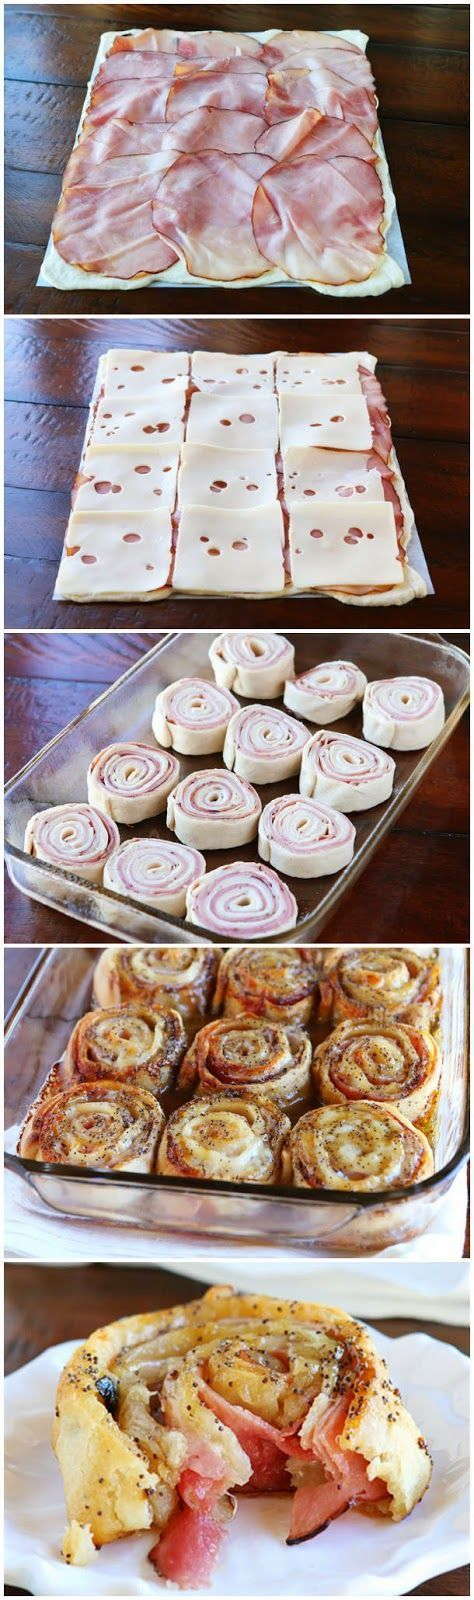 Hot Ham & Cheese Party Rolls | Kevin & Amandas Recipes | Food & Travel Blog